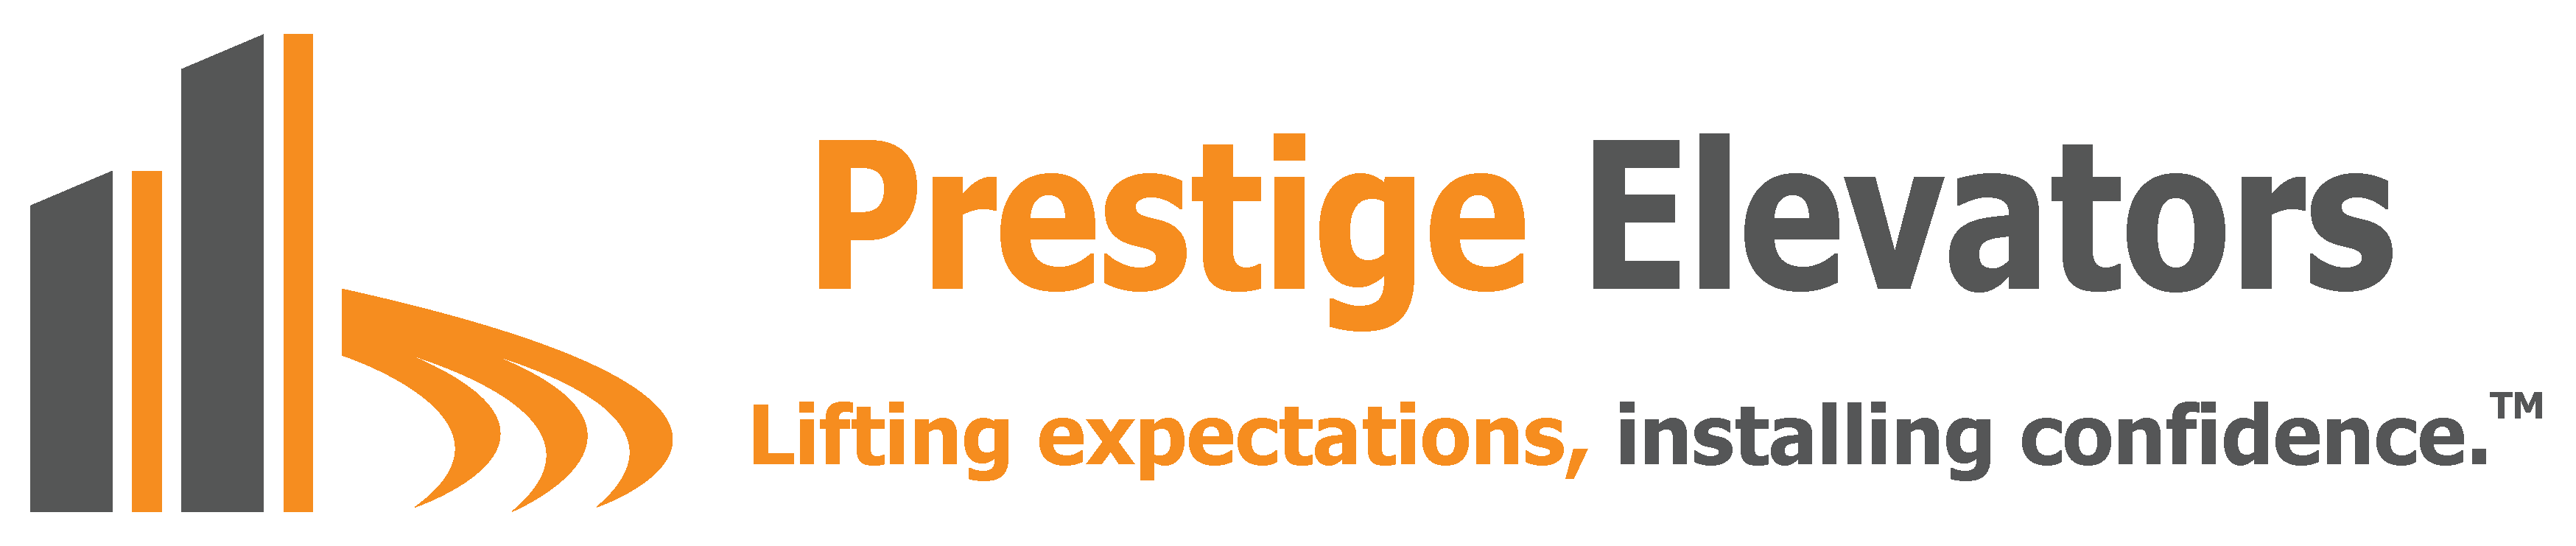 prestige-elevators-slogan-tm-3